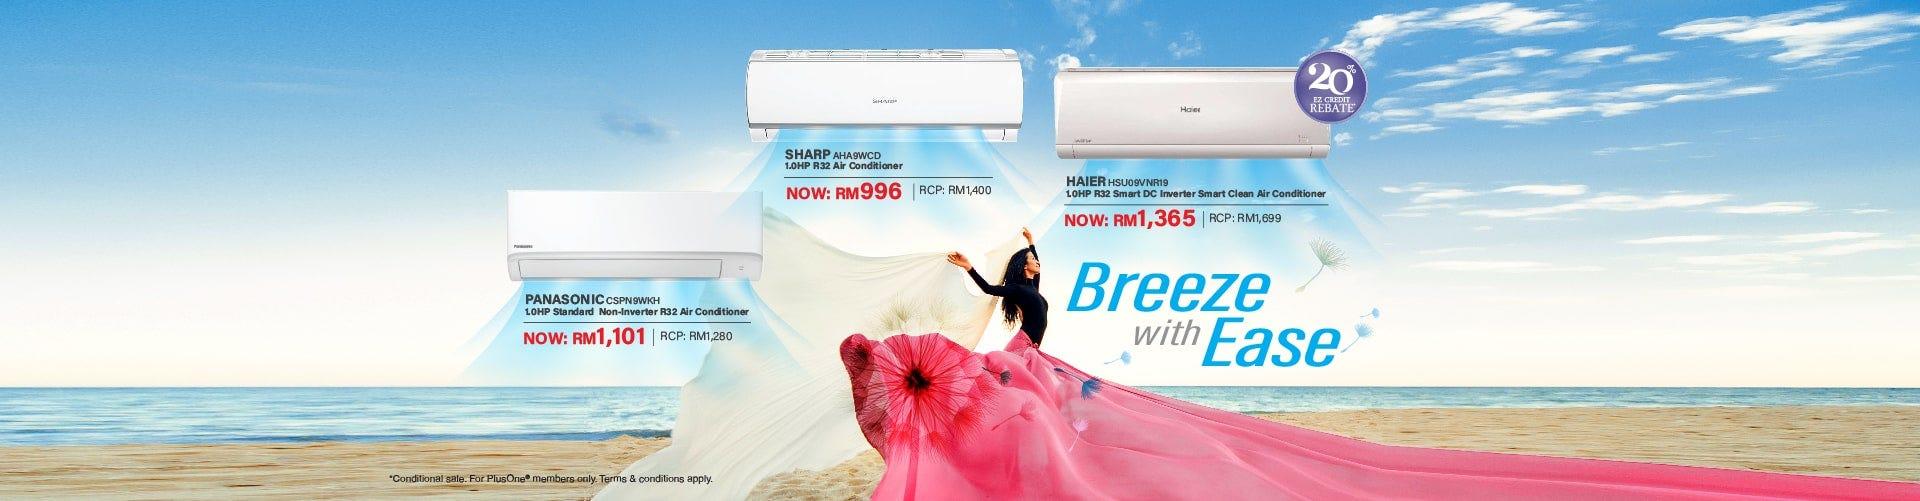 Breeze with Ease Desktop